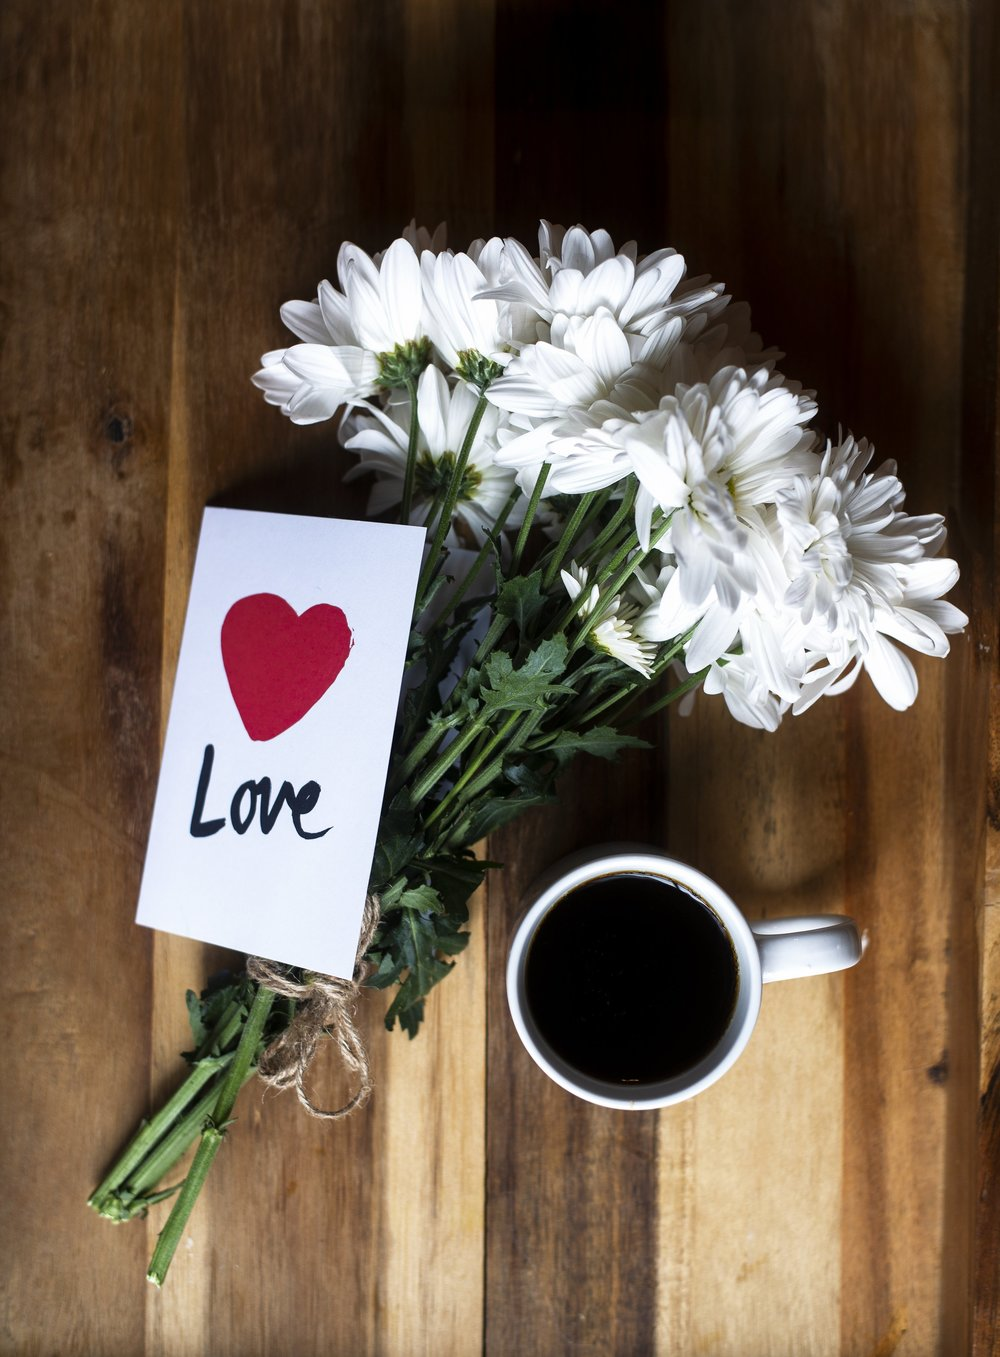 morning-love-greeting_4460x4460.jpg